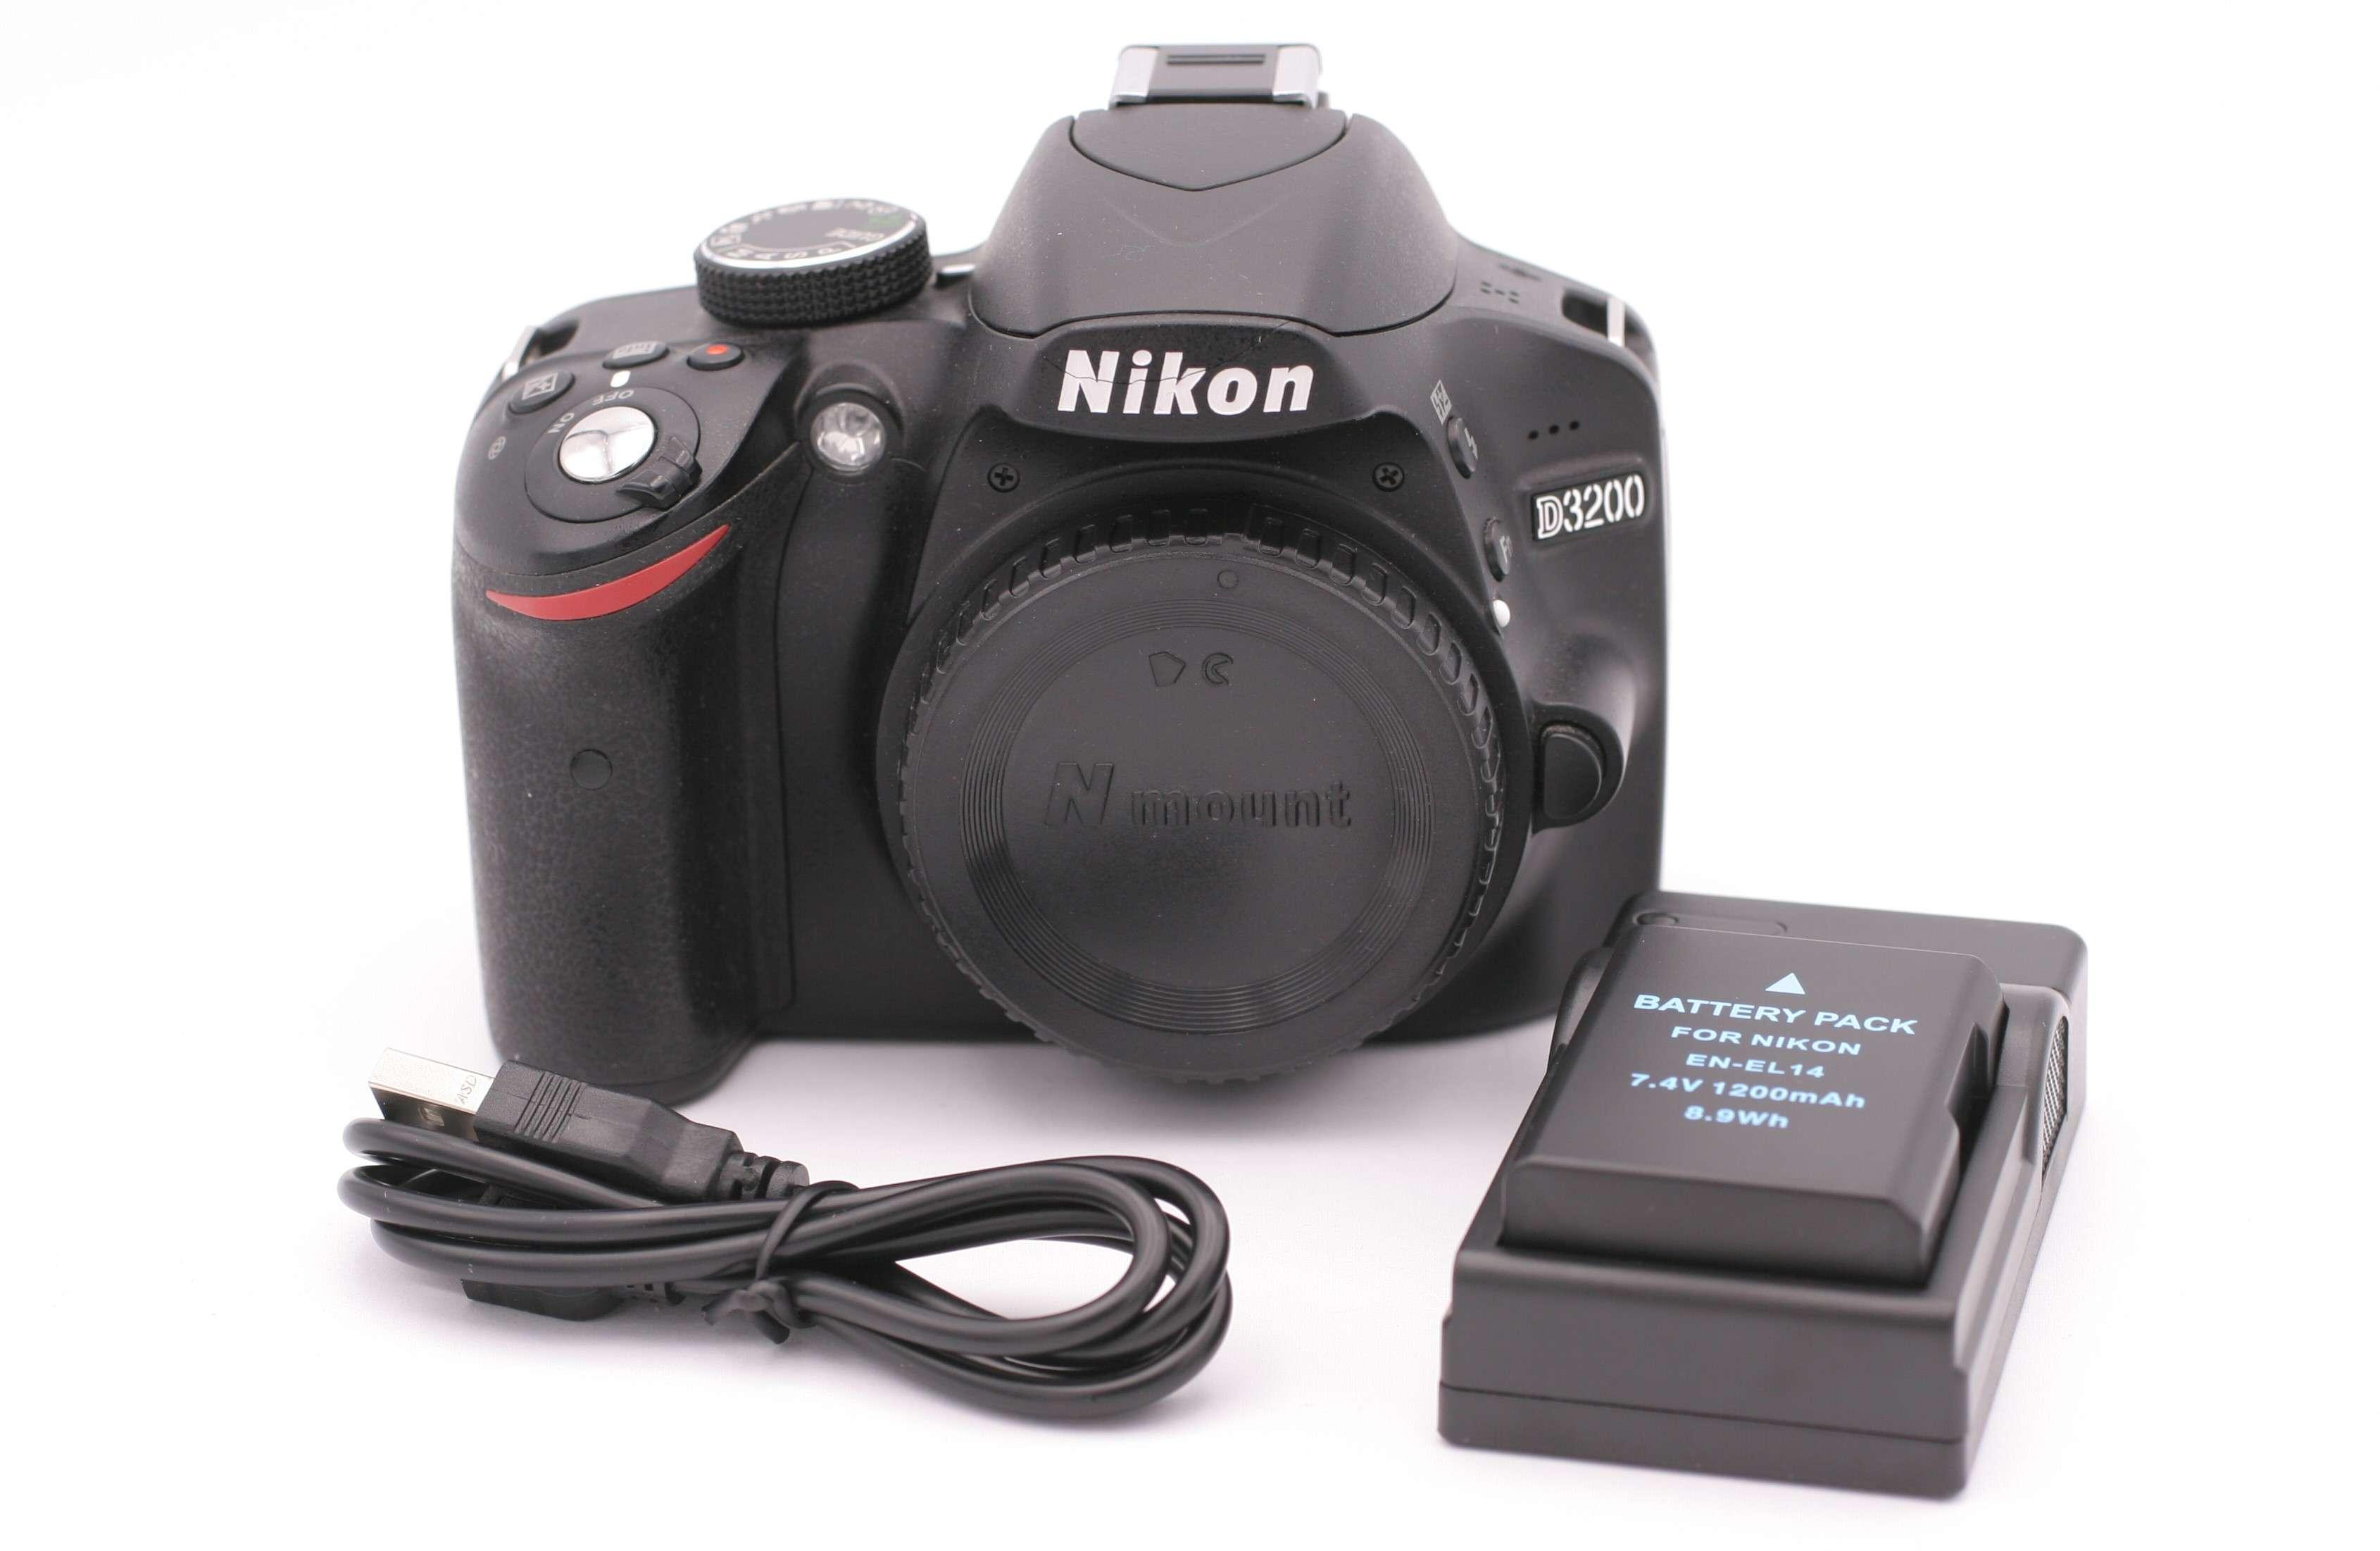 Details about Nikon D3200 24 2MP Digital SLR Camera - Black (Body Only) -  Shutter Count: 1560